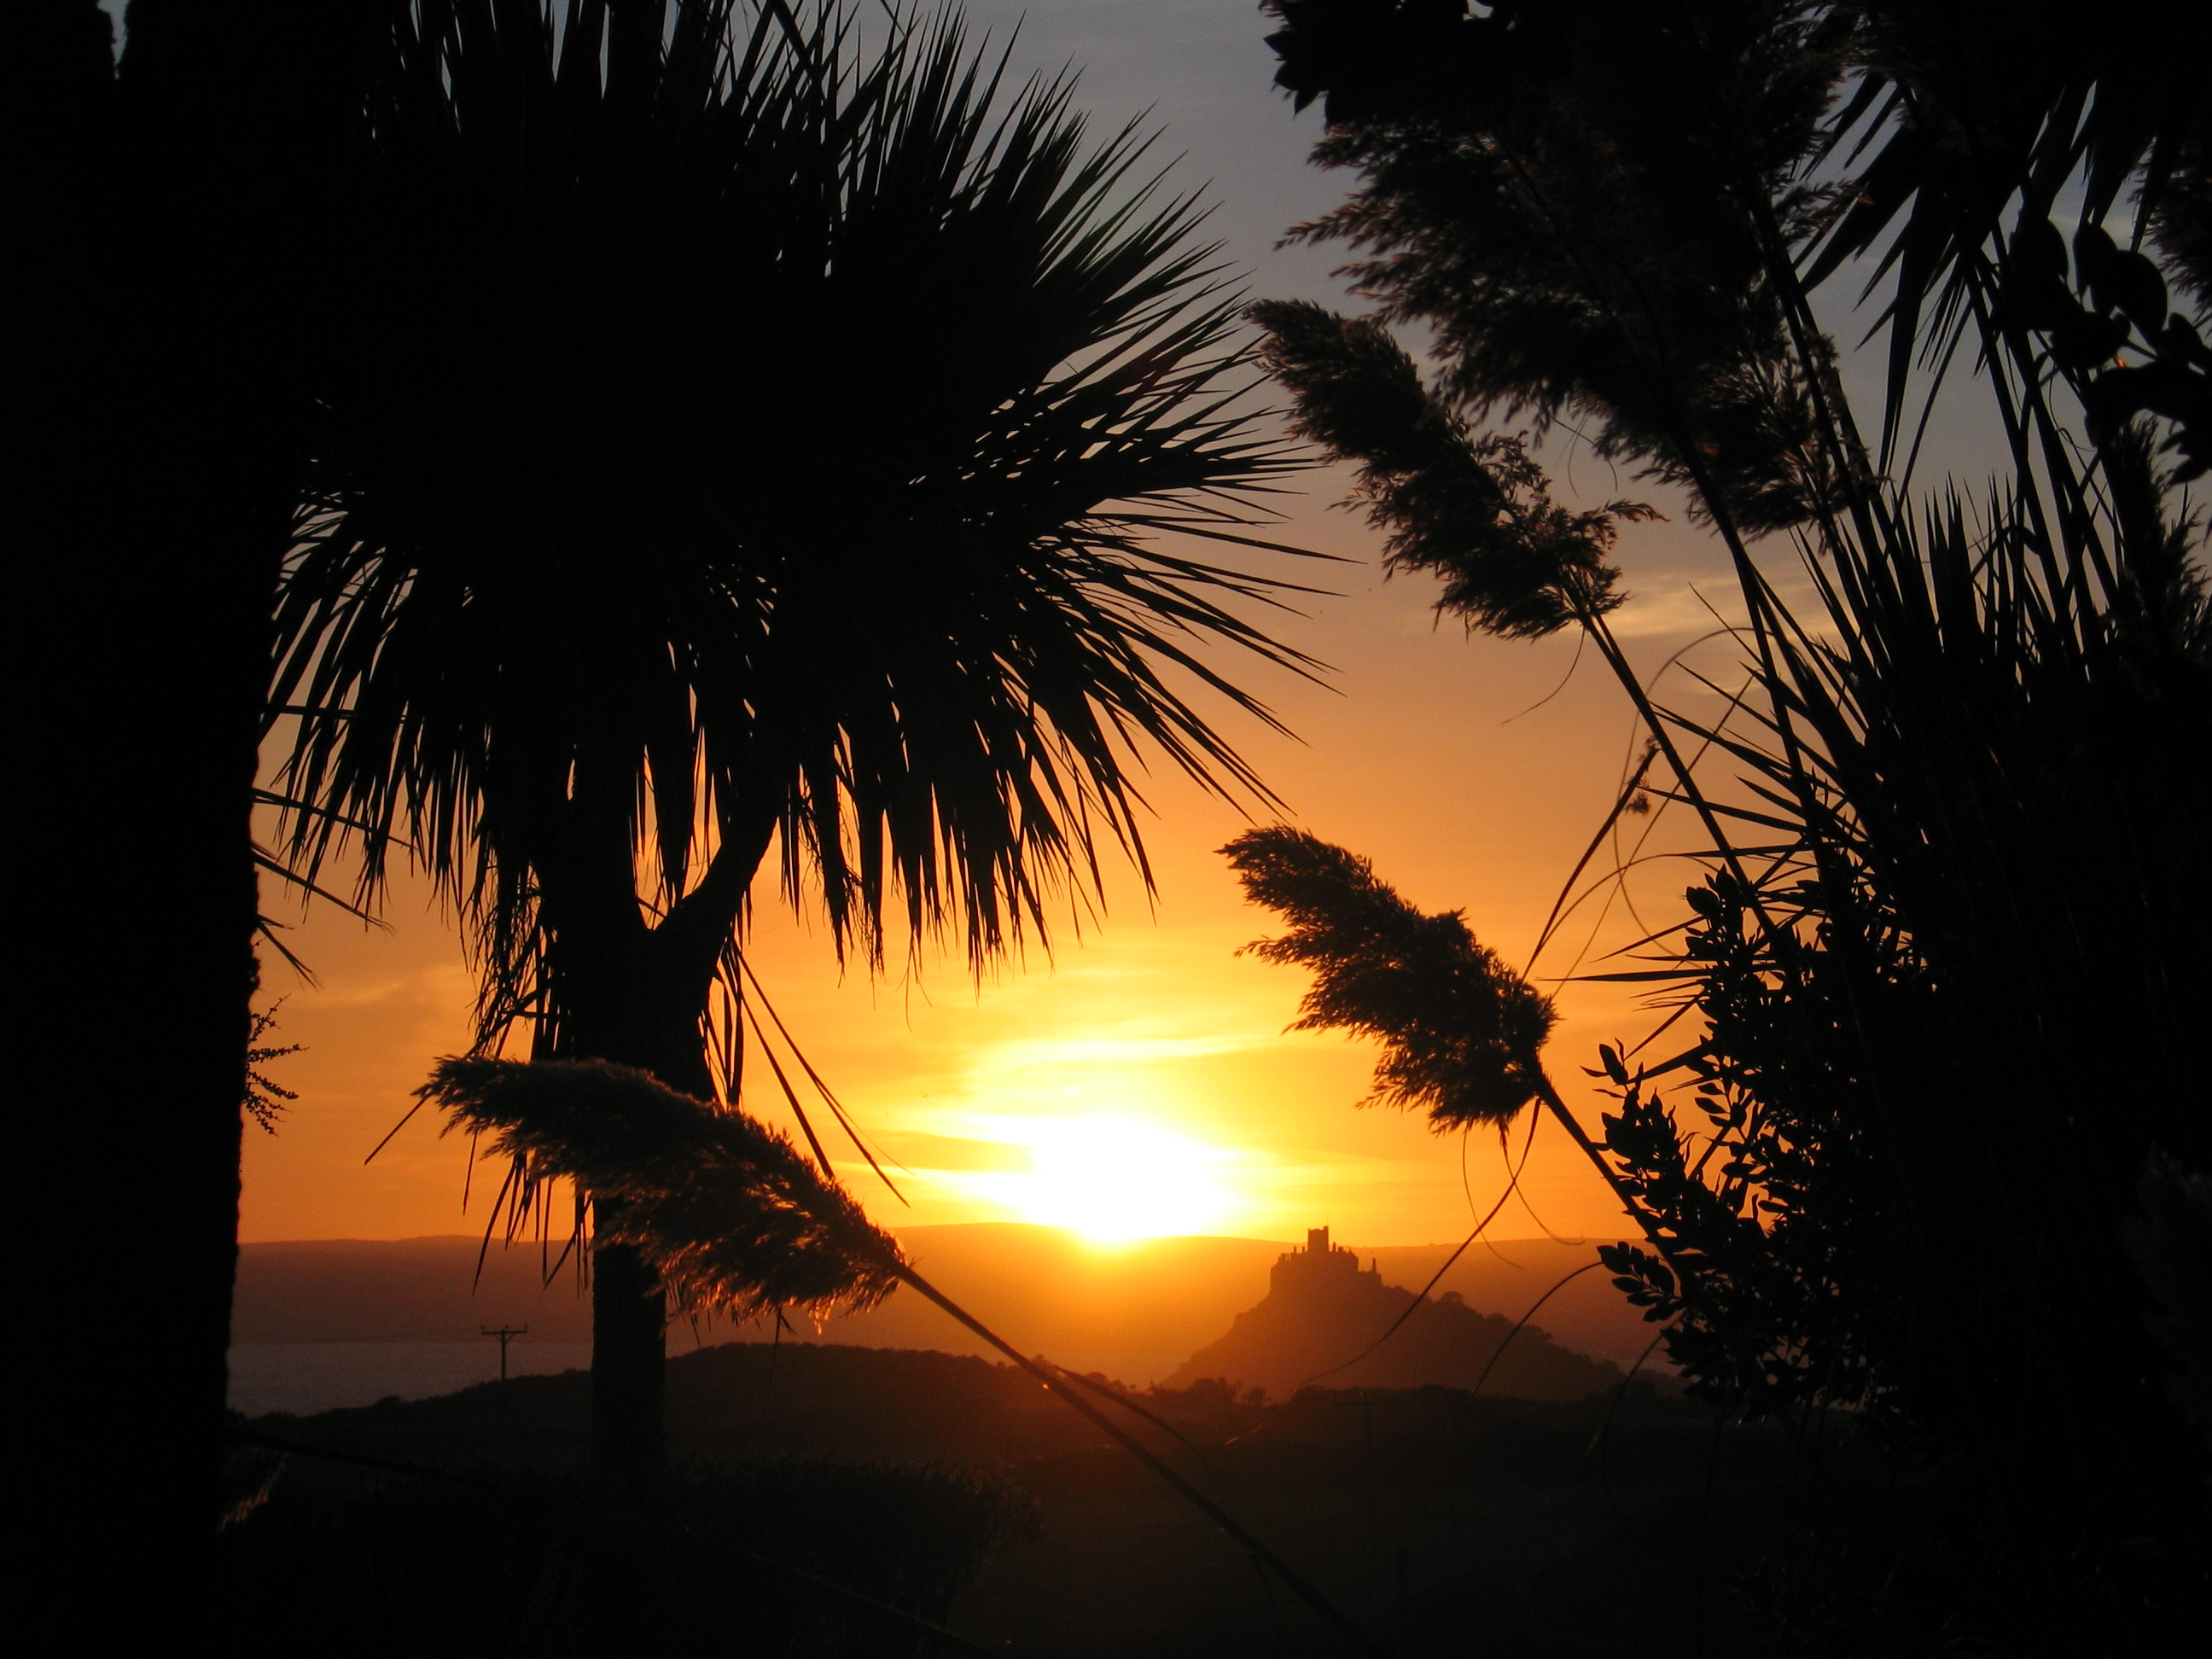 Sunset over Mounts Bay, Cornwall in September